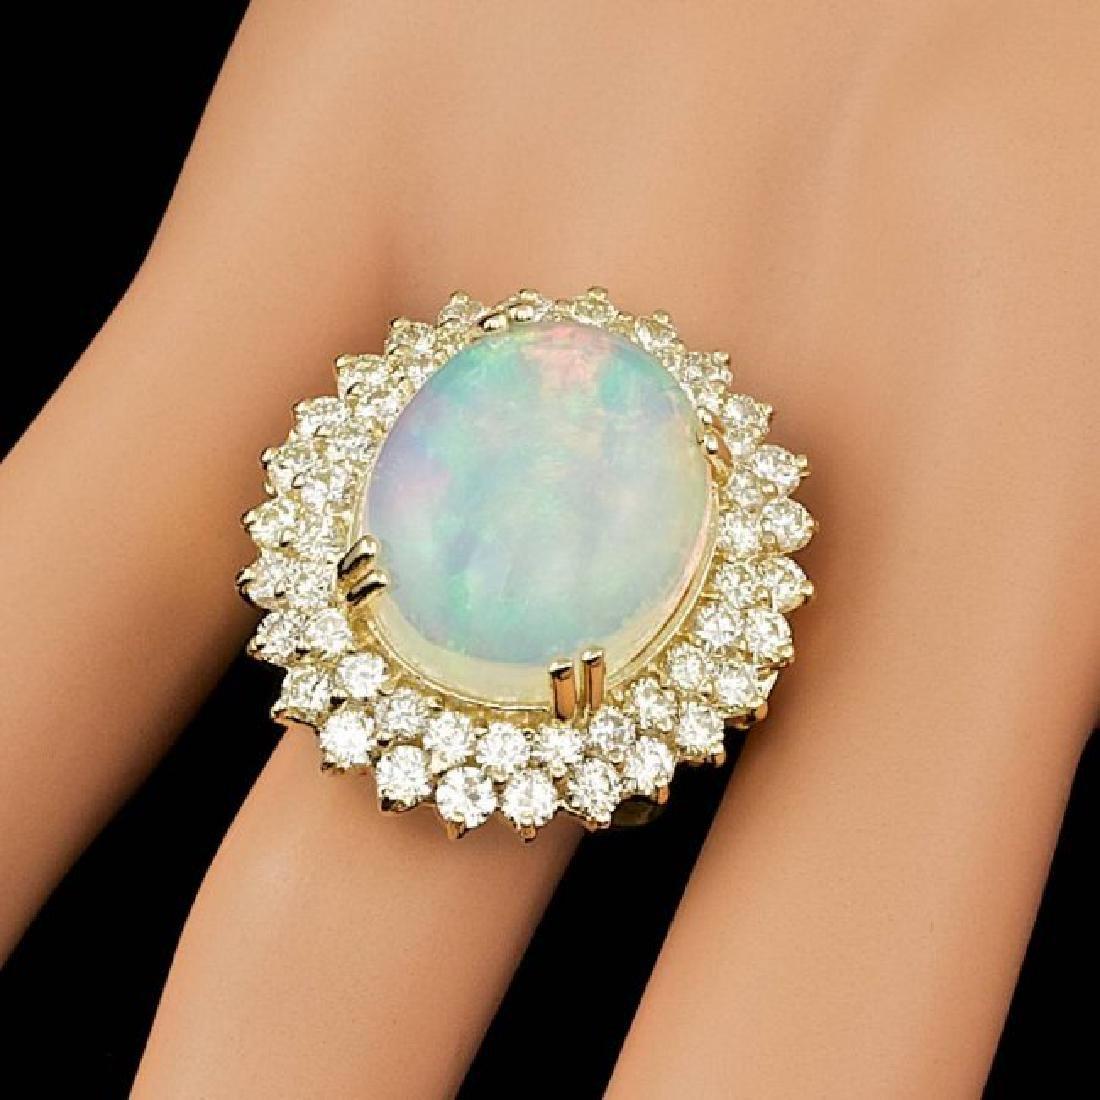 14k Yellow Gold 9.00ct Opal 3.15ct Diamond Ring - 3